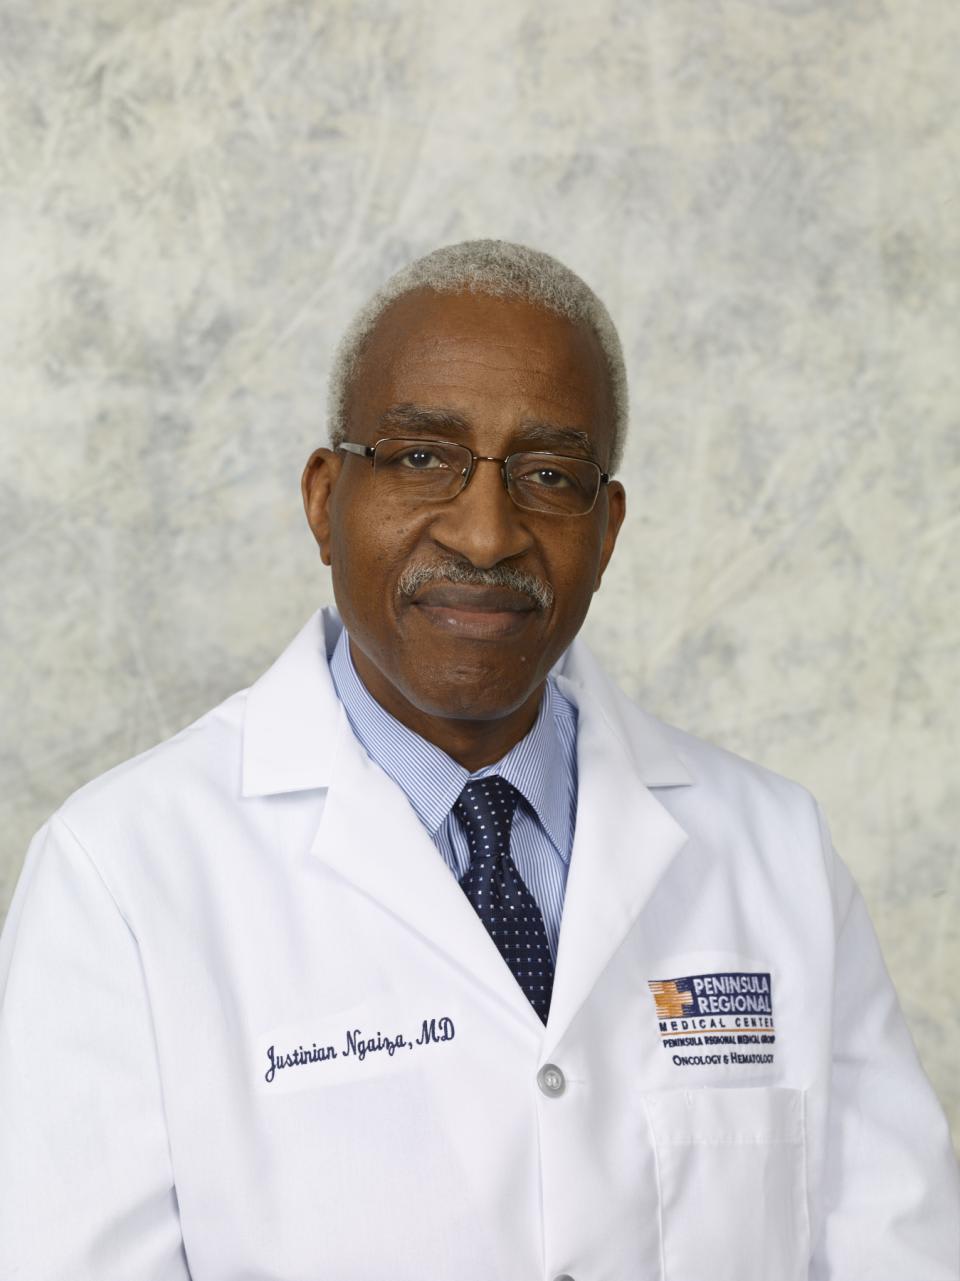 Dr. Justinian R Ngaiza MD